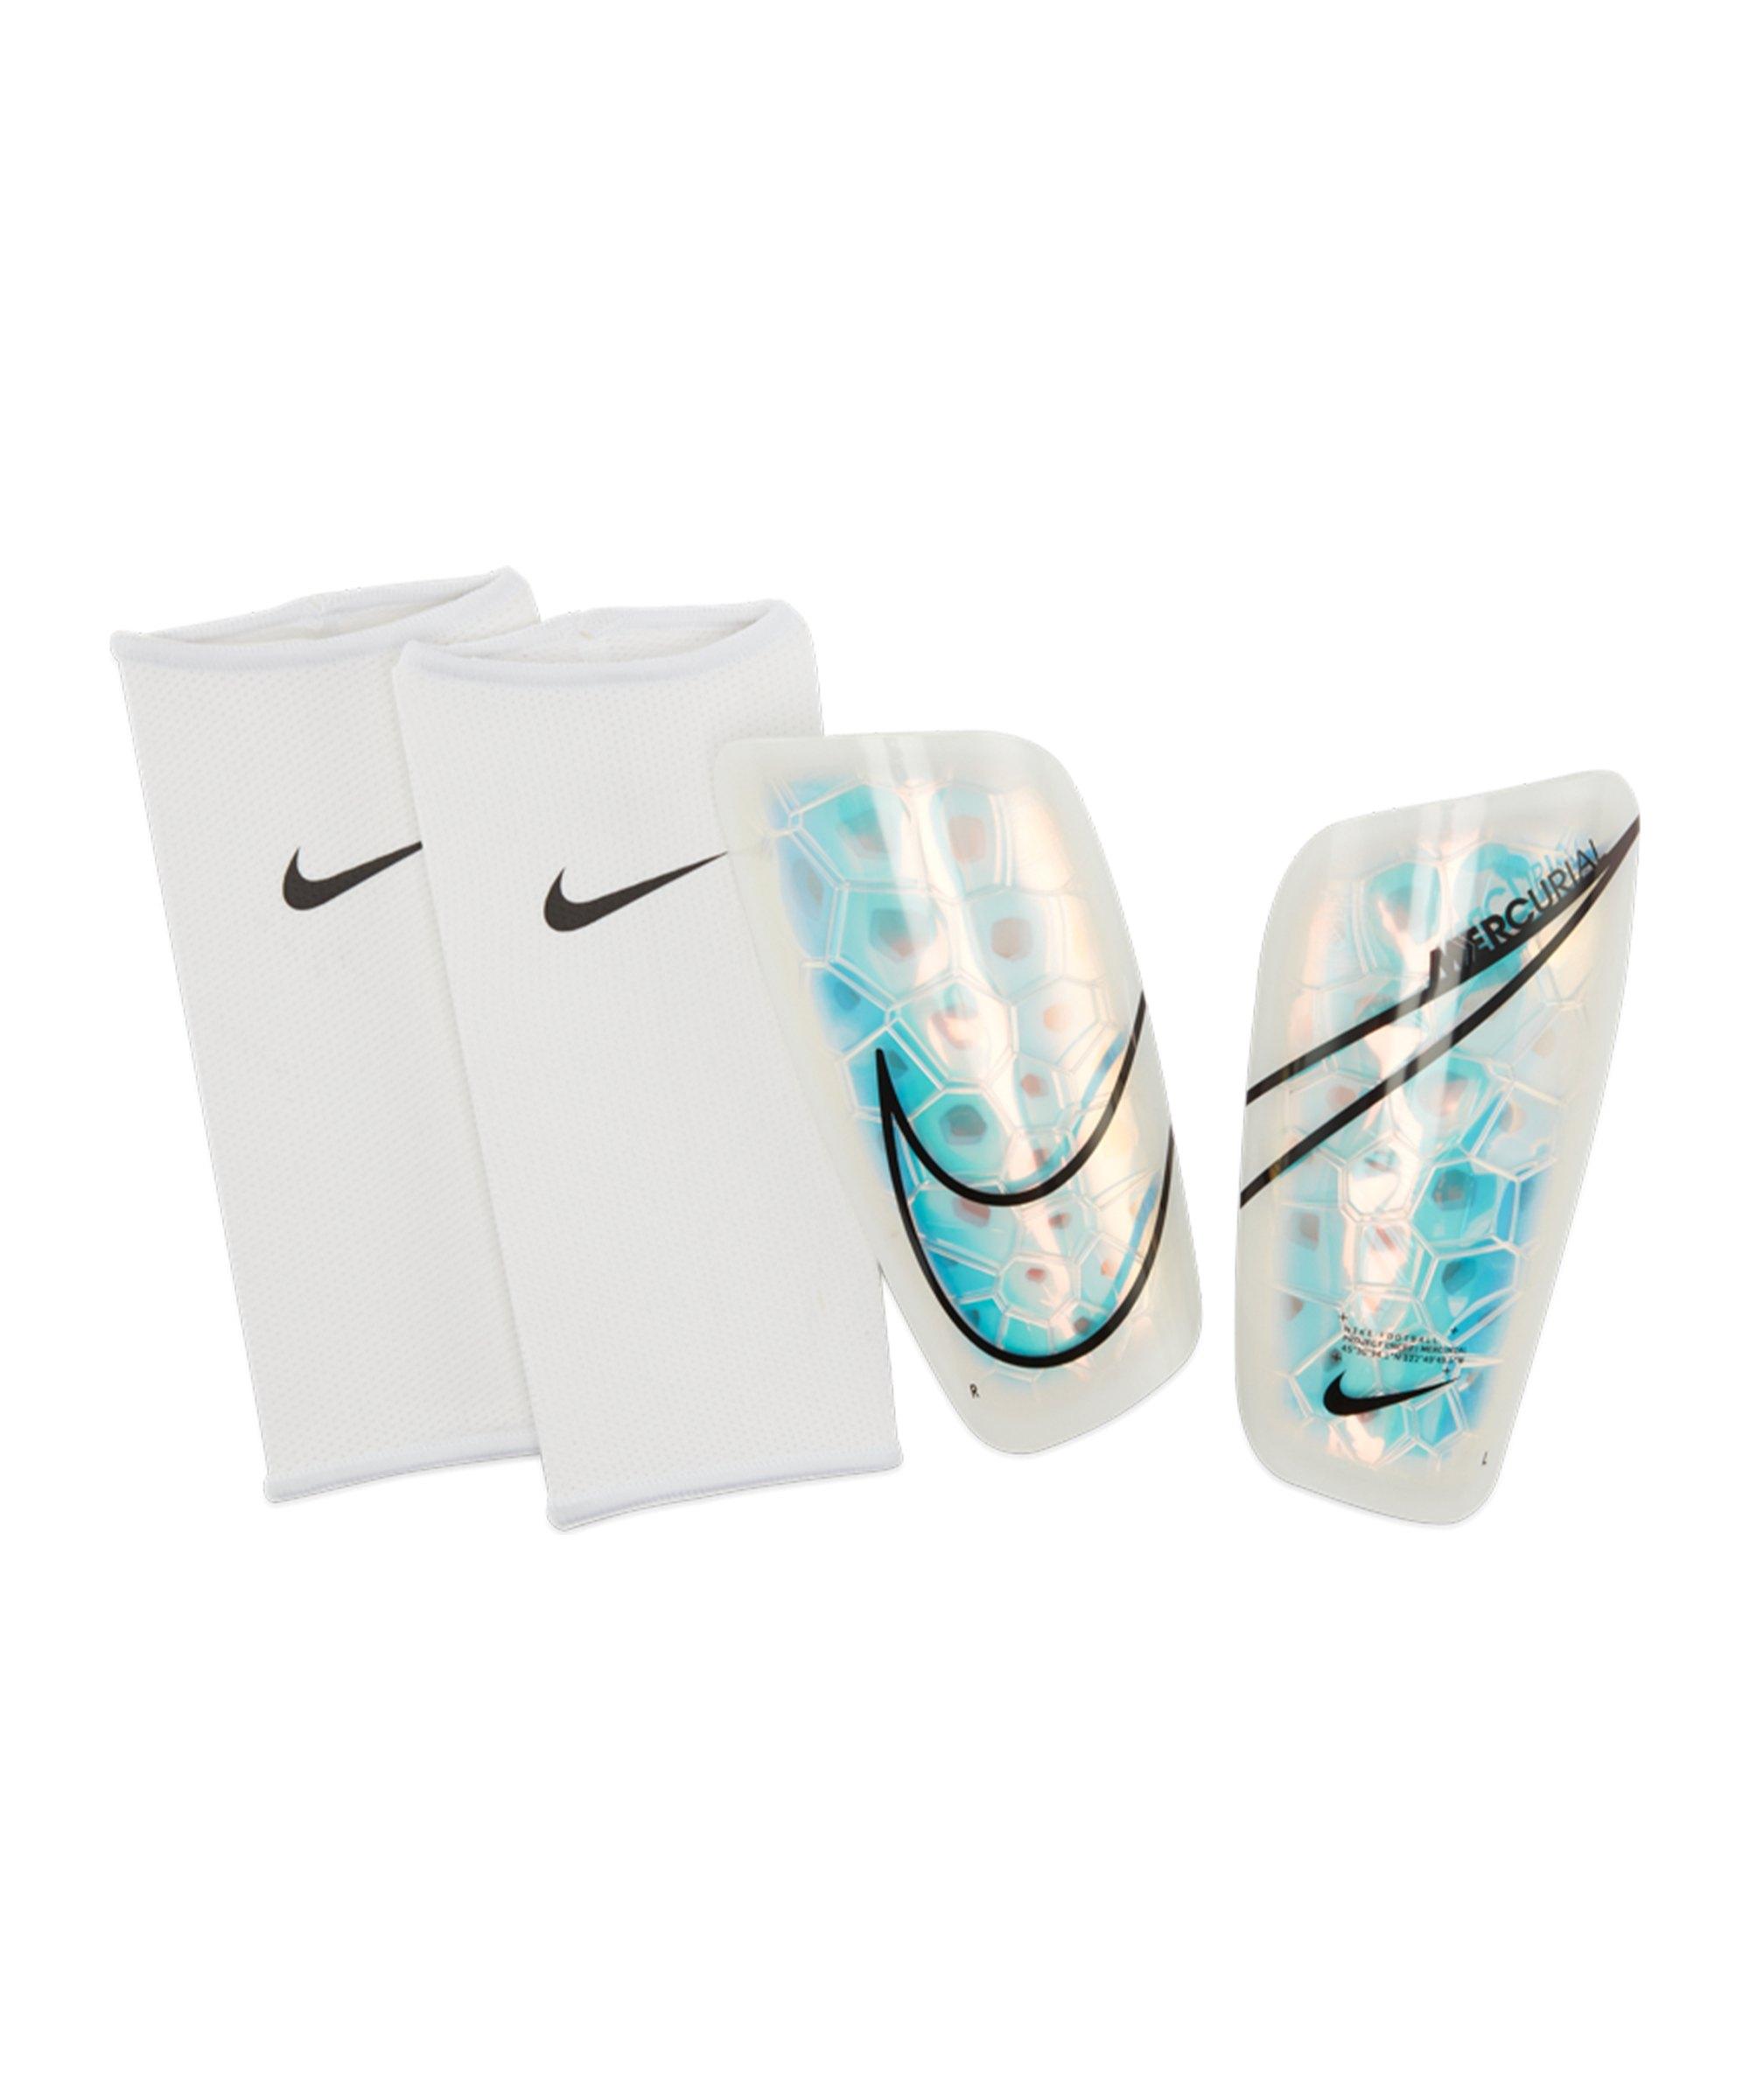 Nike Mercurial Lite Schienbeinschoner F108 - weiss